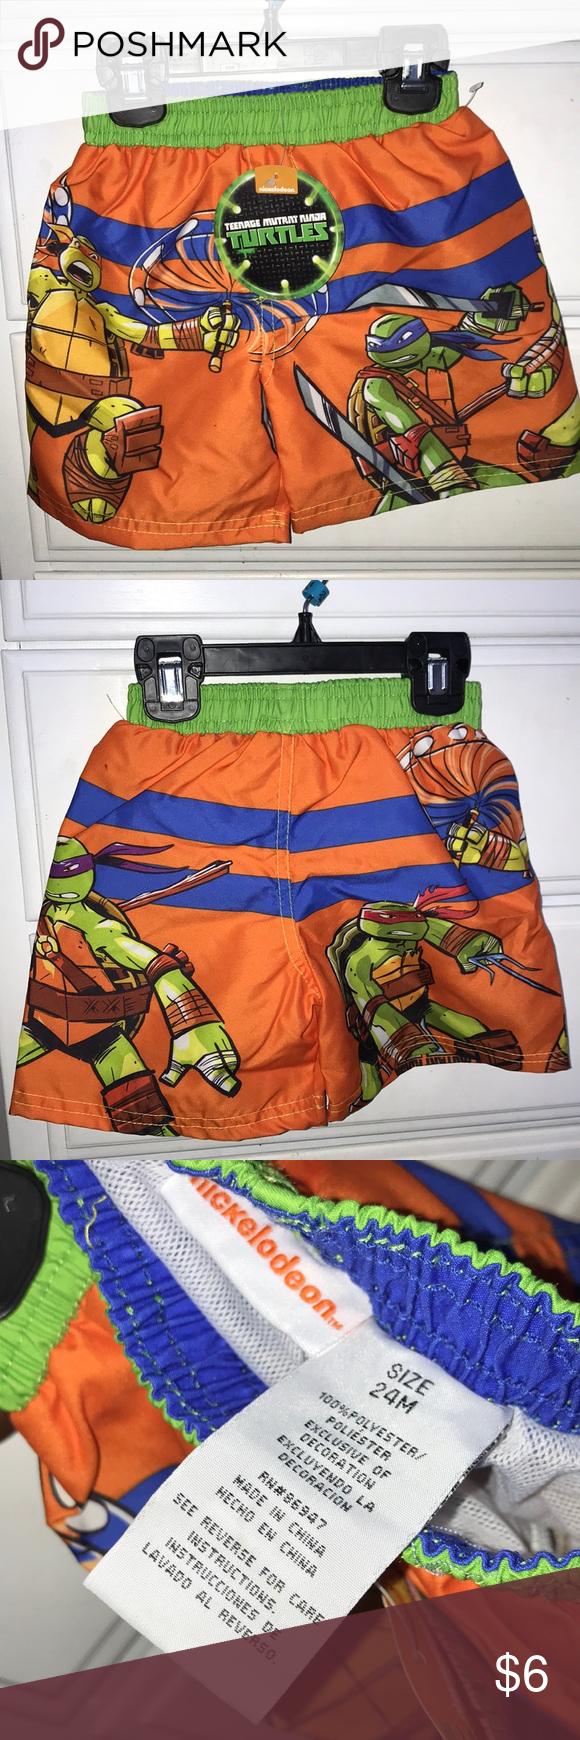 NWT Teenage Mutant Ninja Turtles Boys Kids Short Sleeved Swim Shirt Top Sz XS